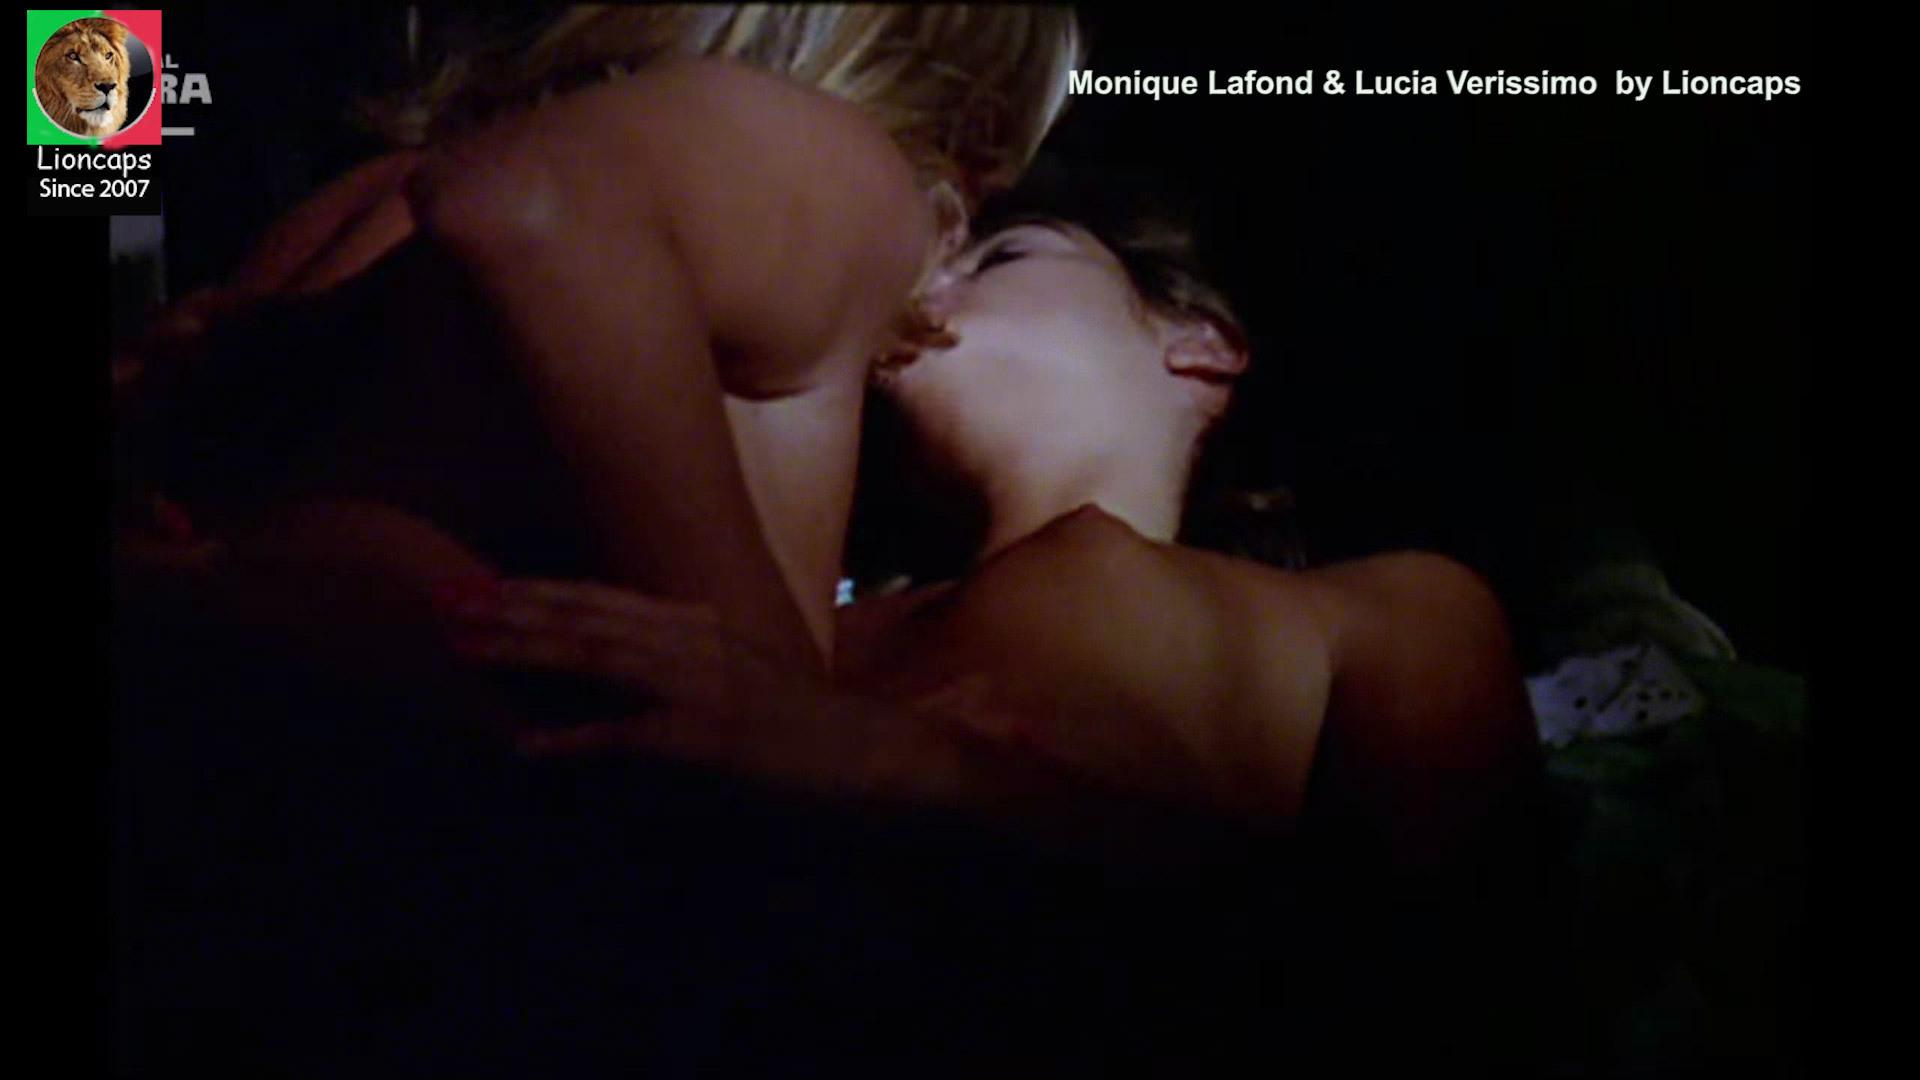 lucia_verissimo_monique_lafond_feras_lioncaps_14_02_2021 (1).jpg